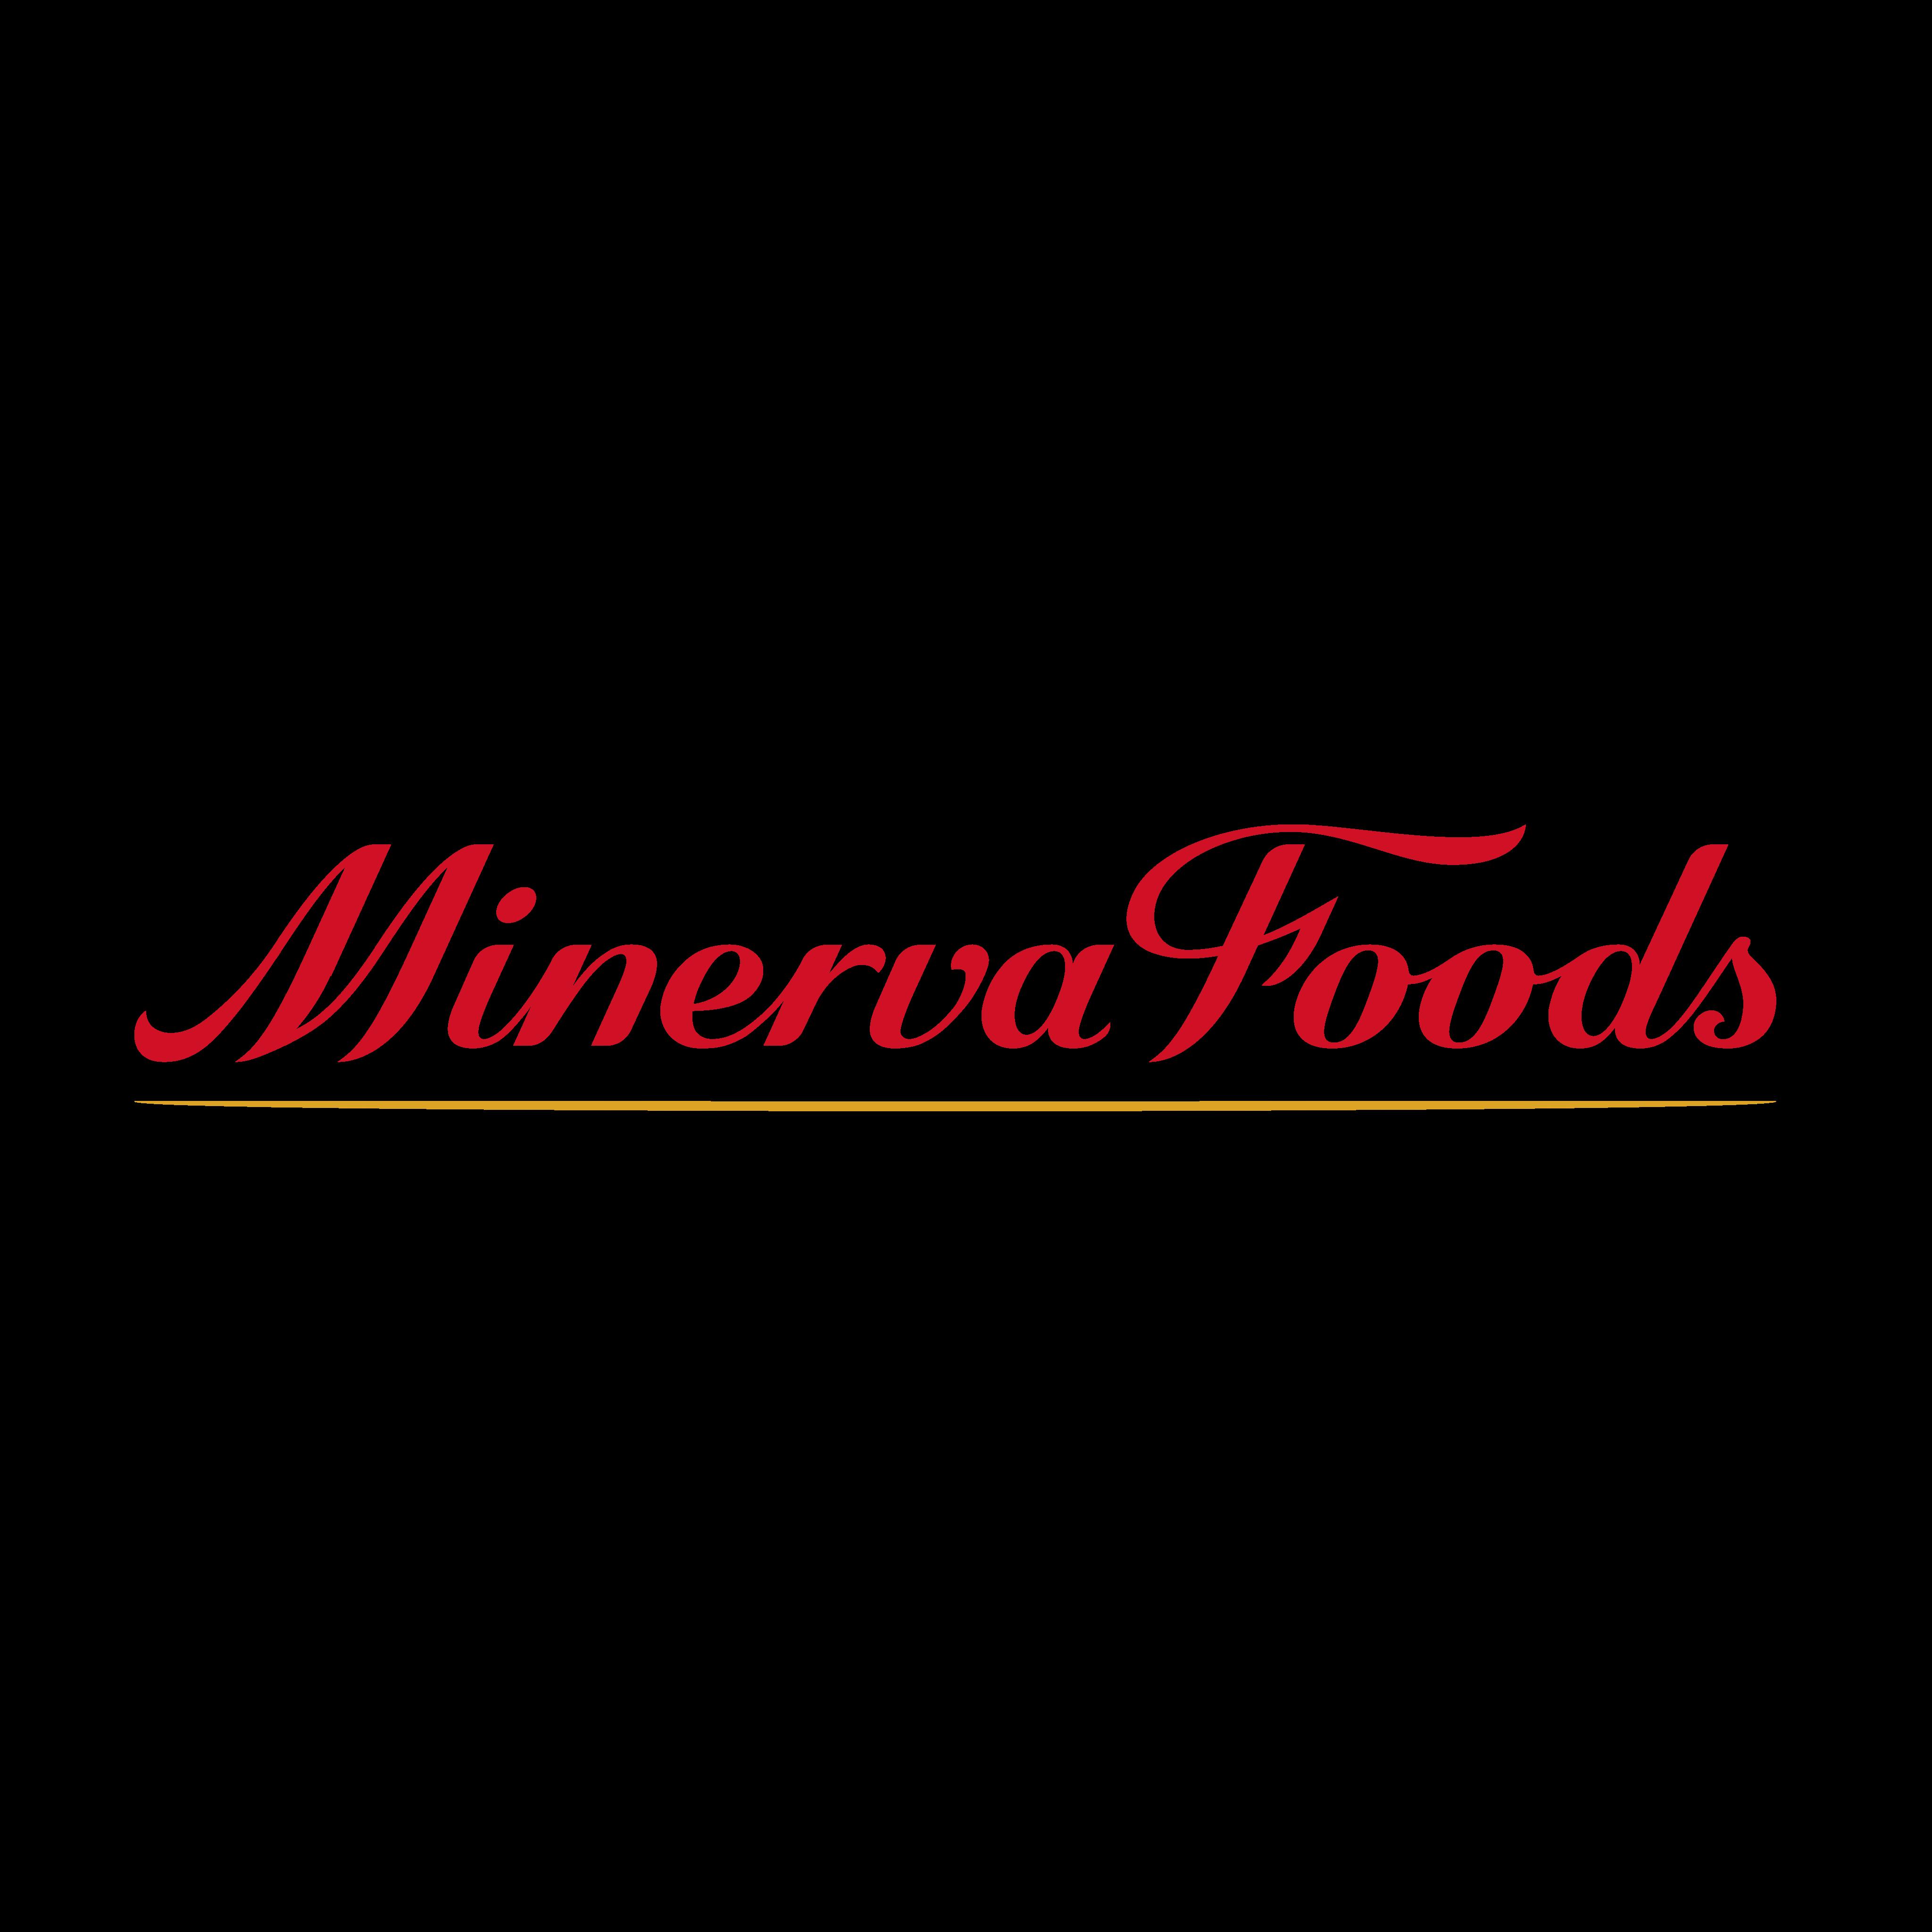 minerva foods logo 0 - Minerva Foods Logo